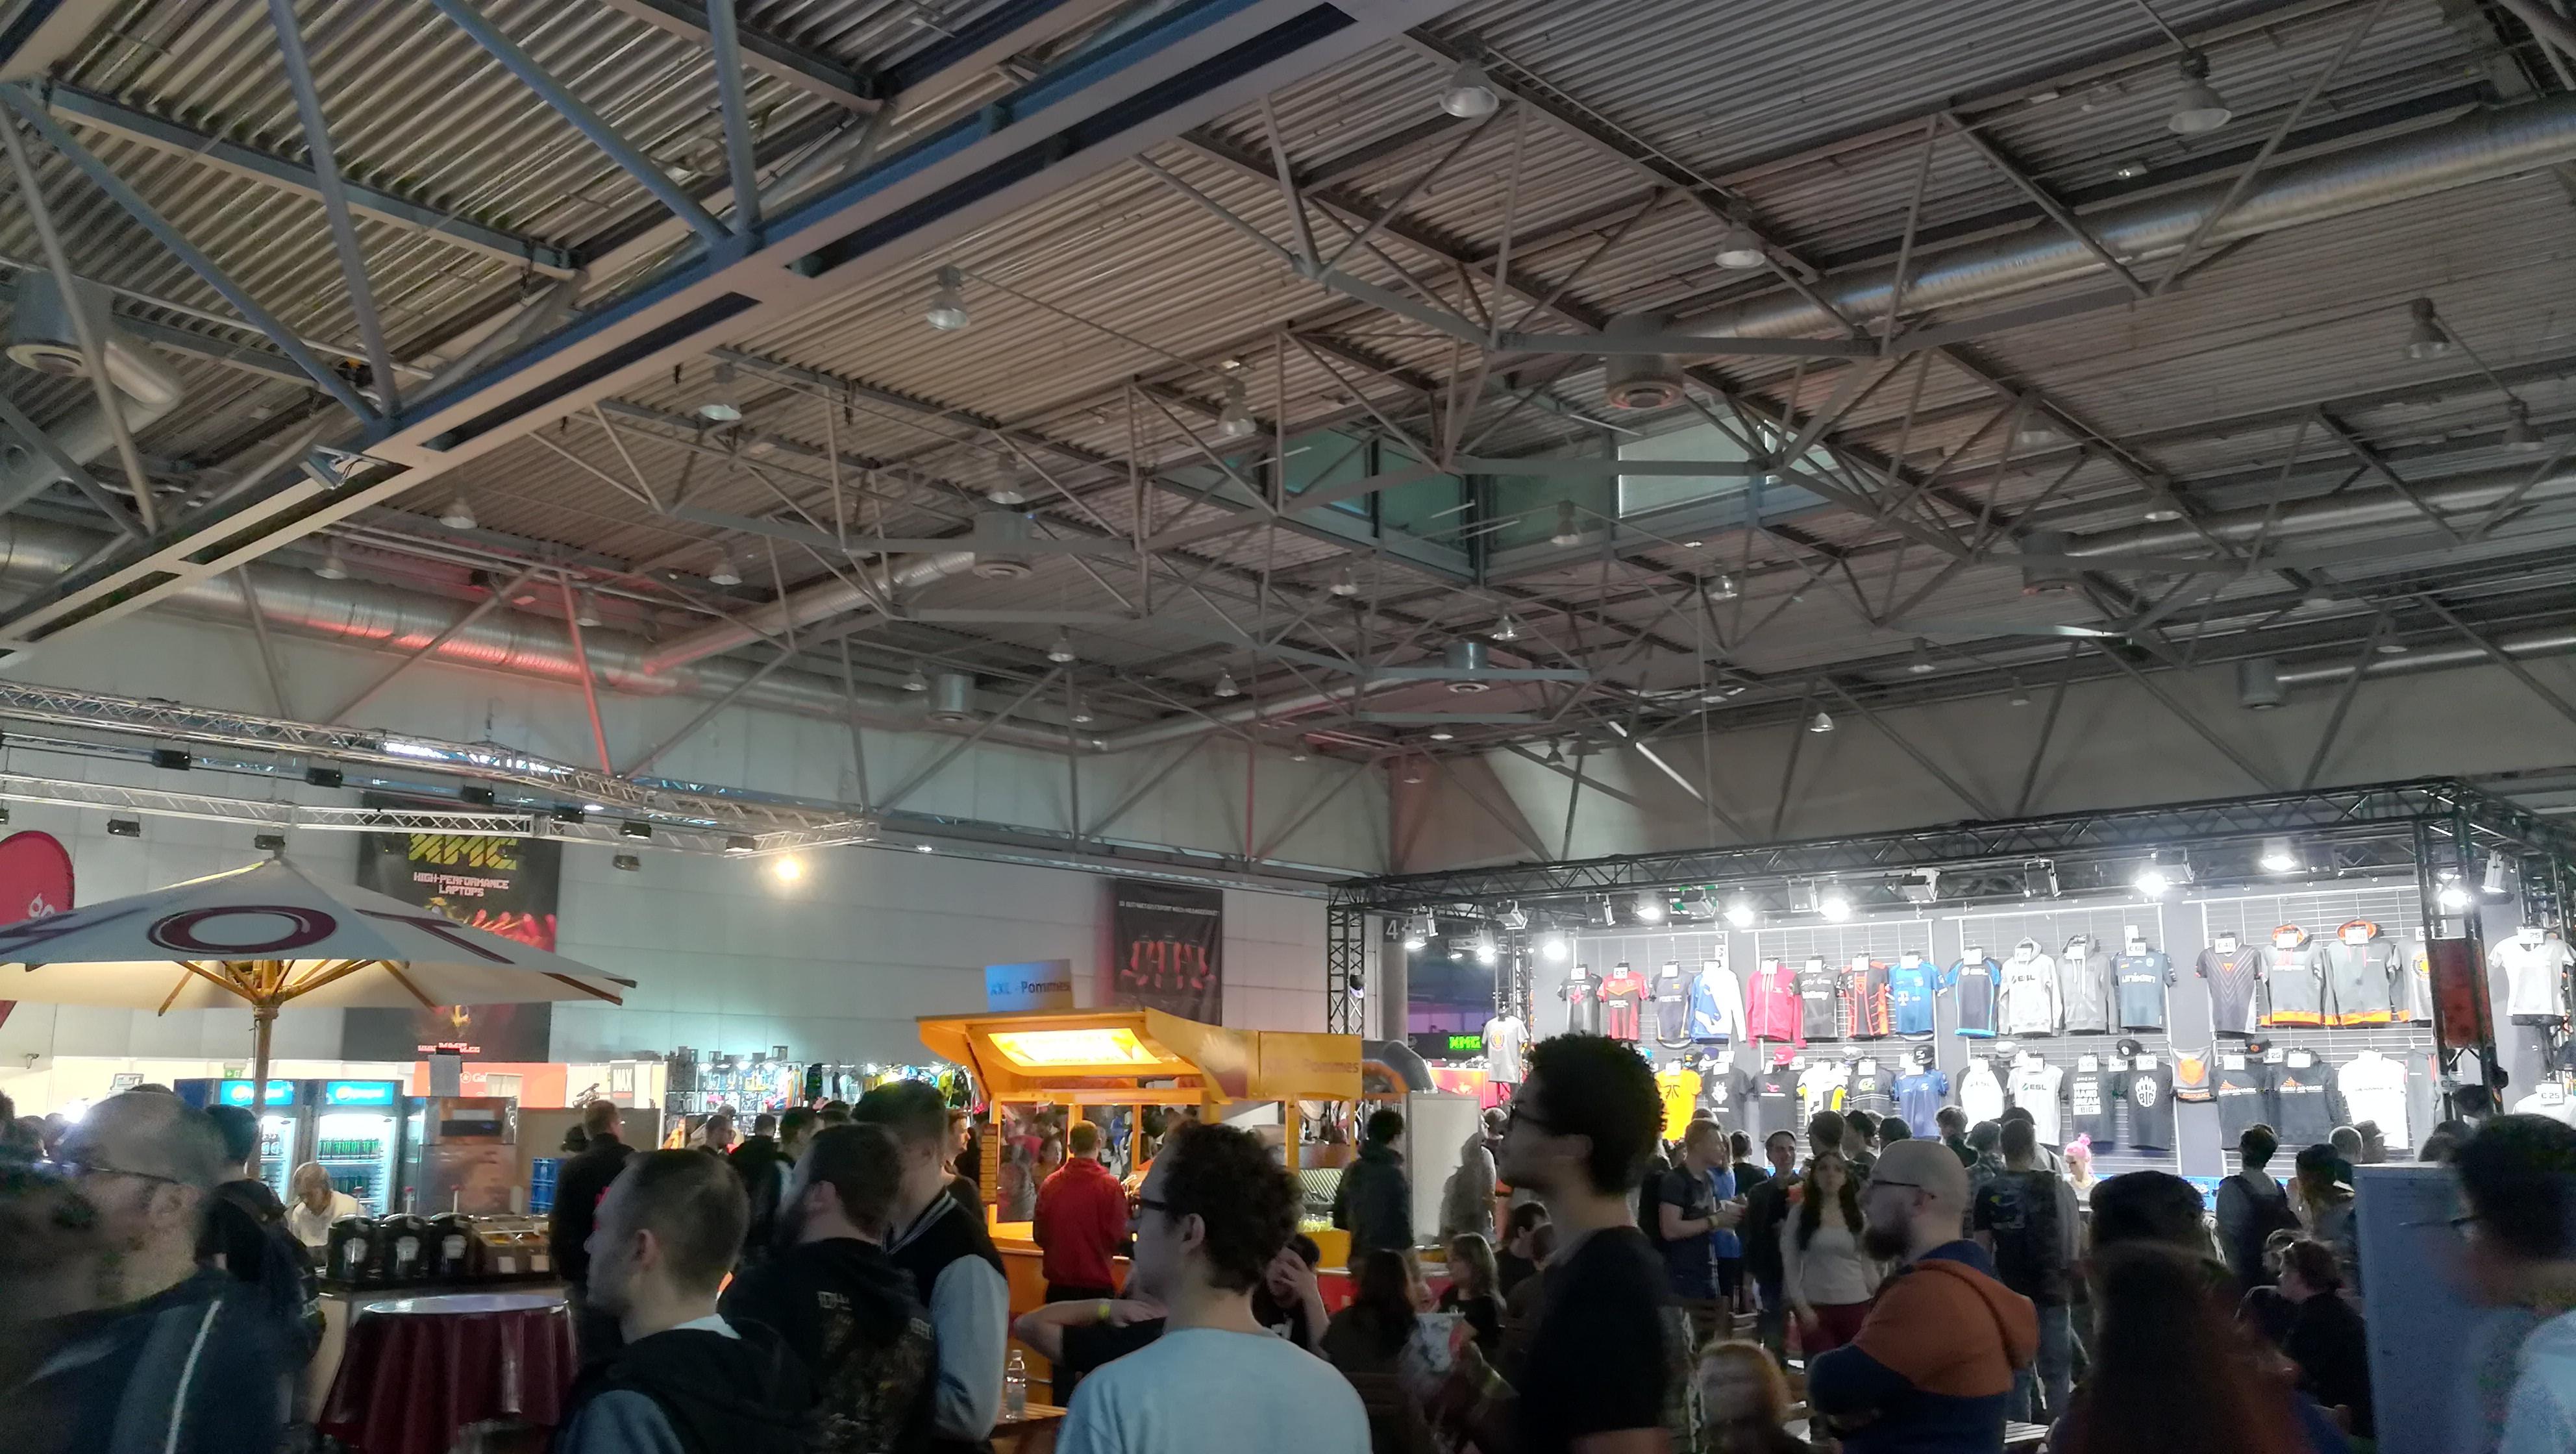 Expo-Bereich